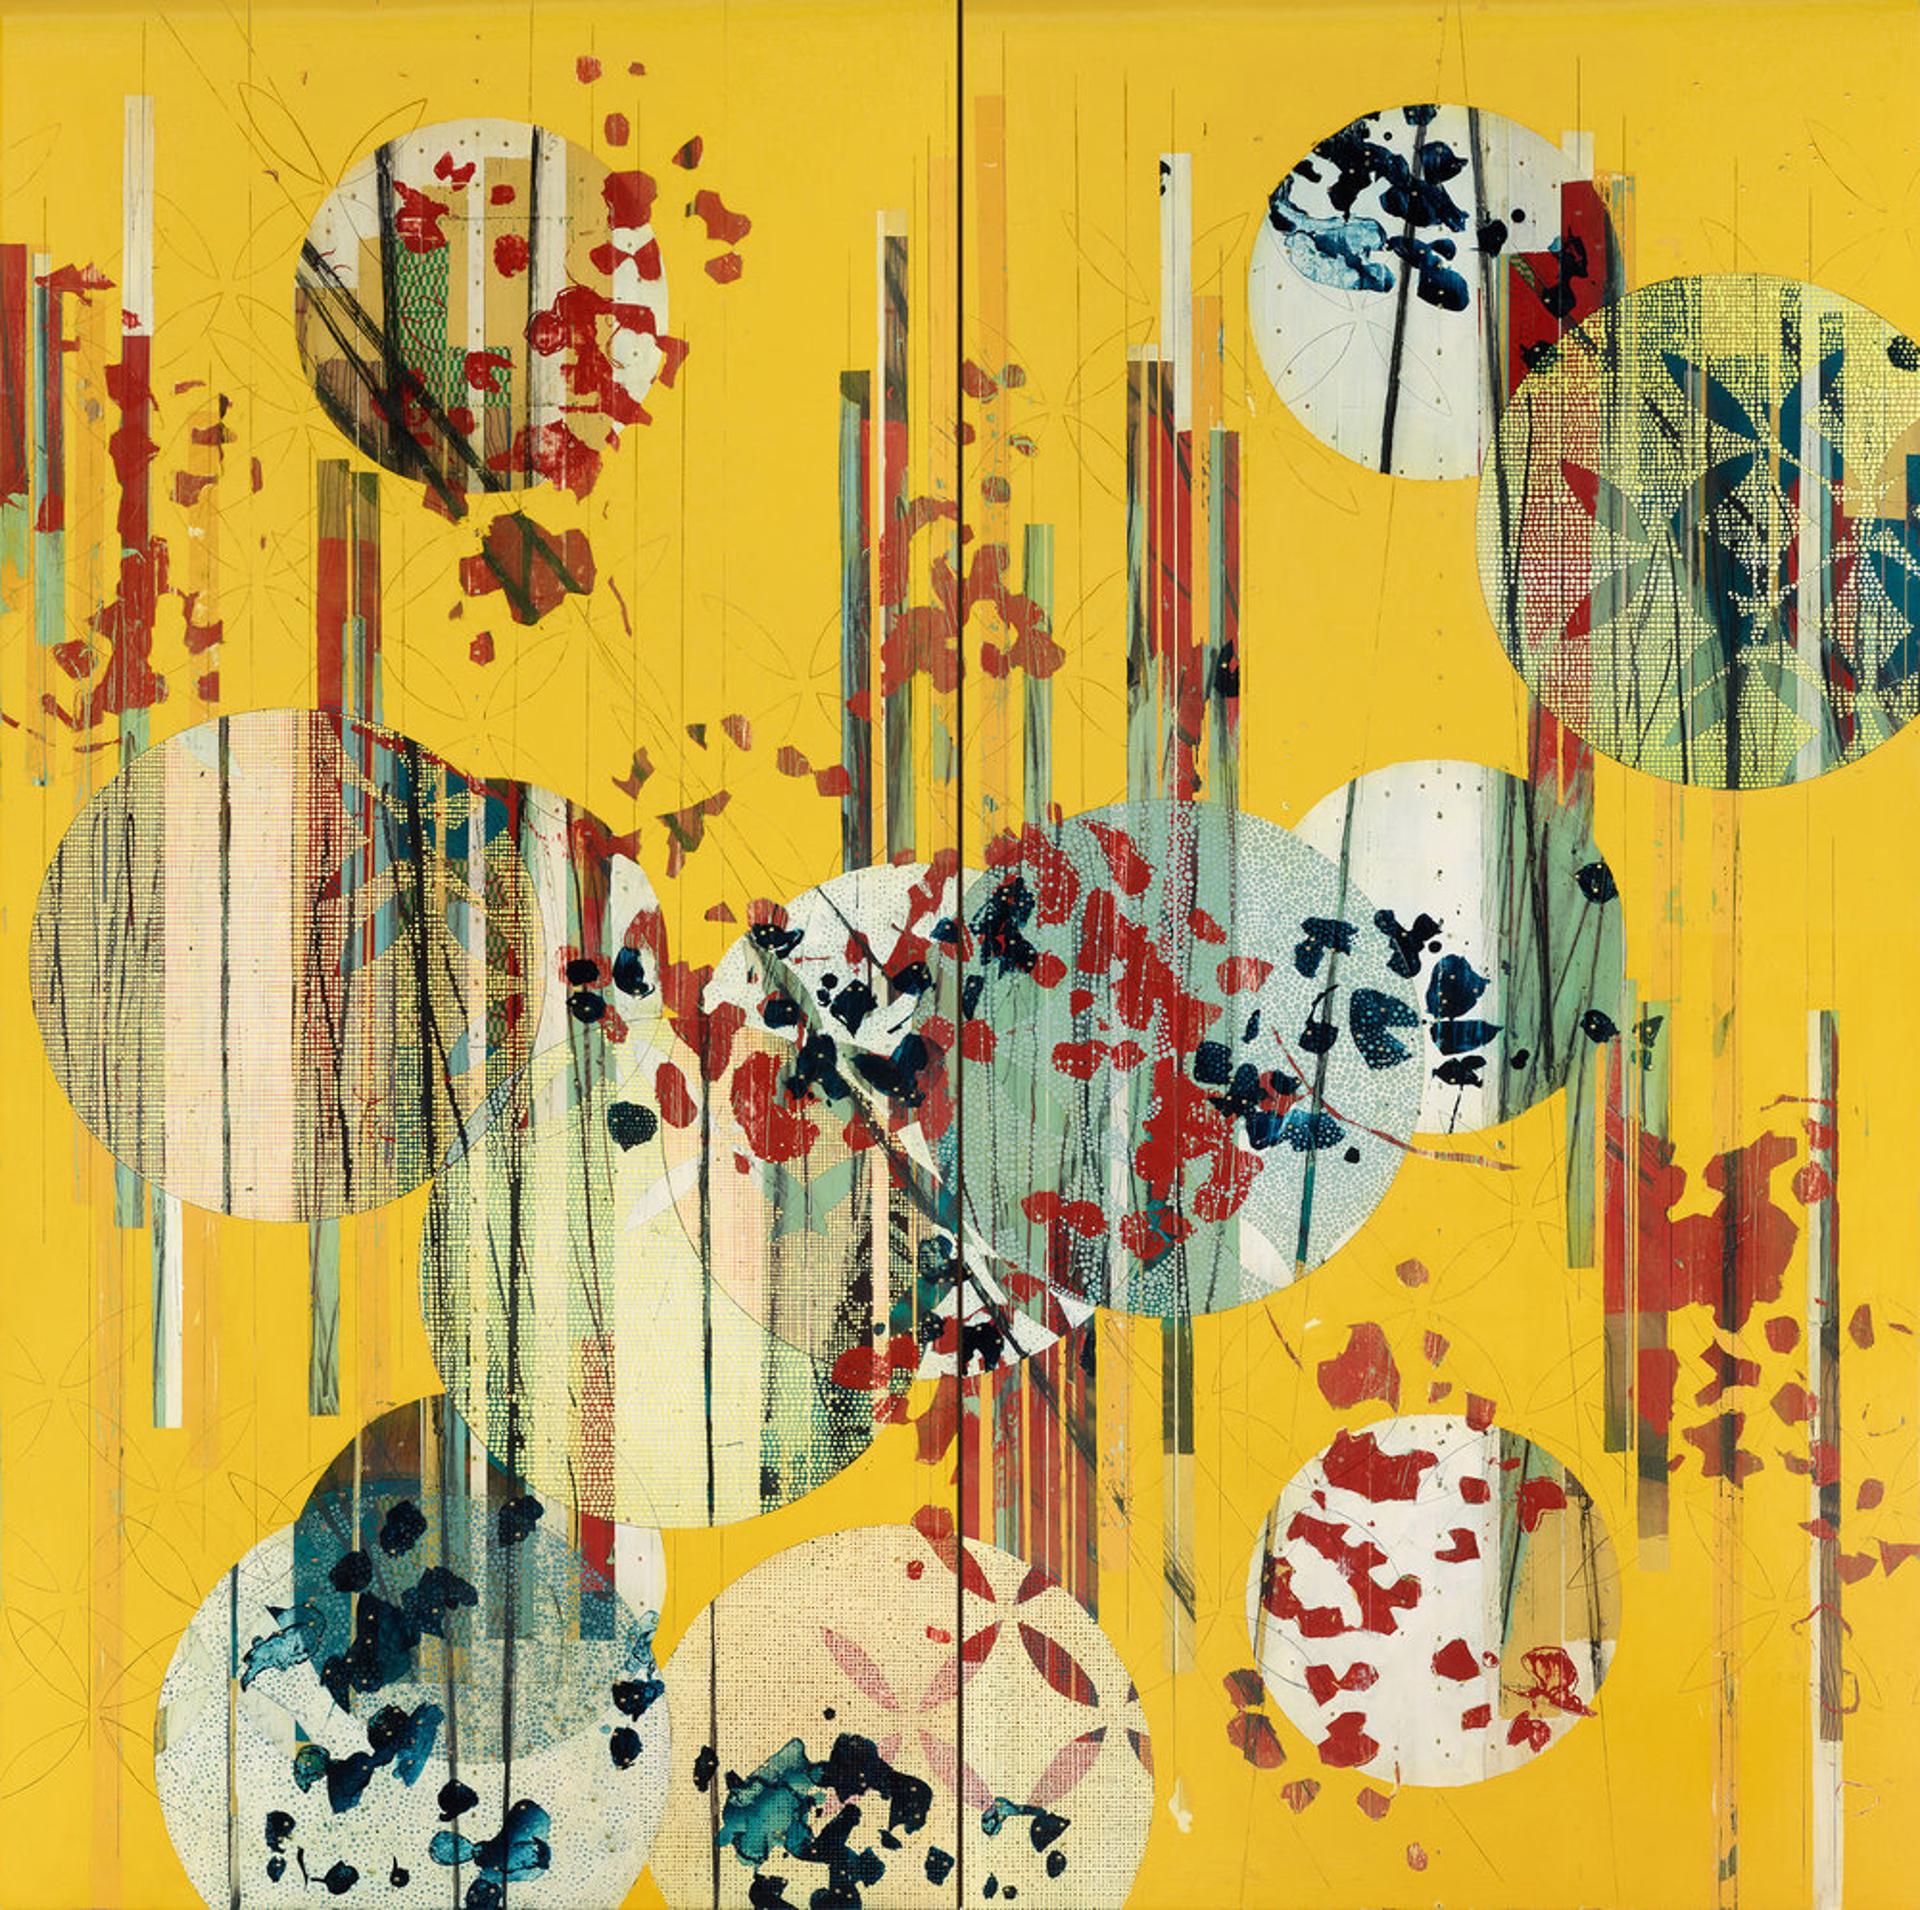 Botanical with Bands and Lanterns / Aspen by Nina Tichava